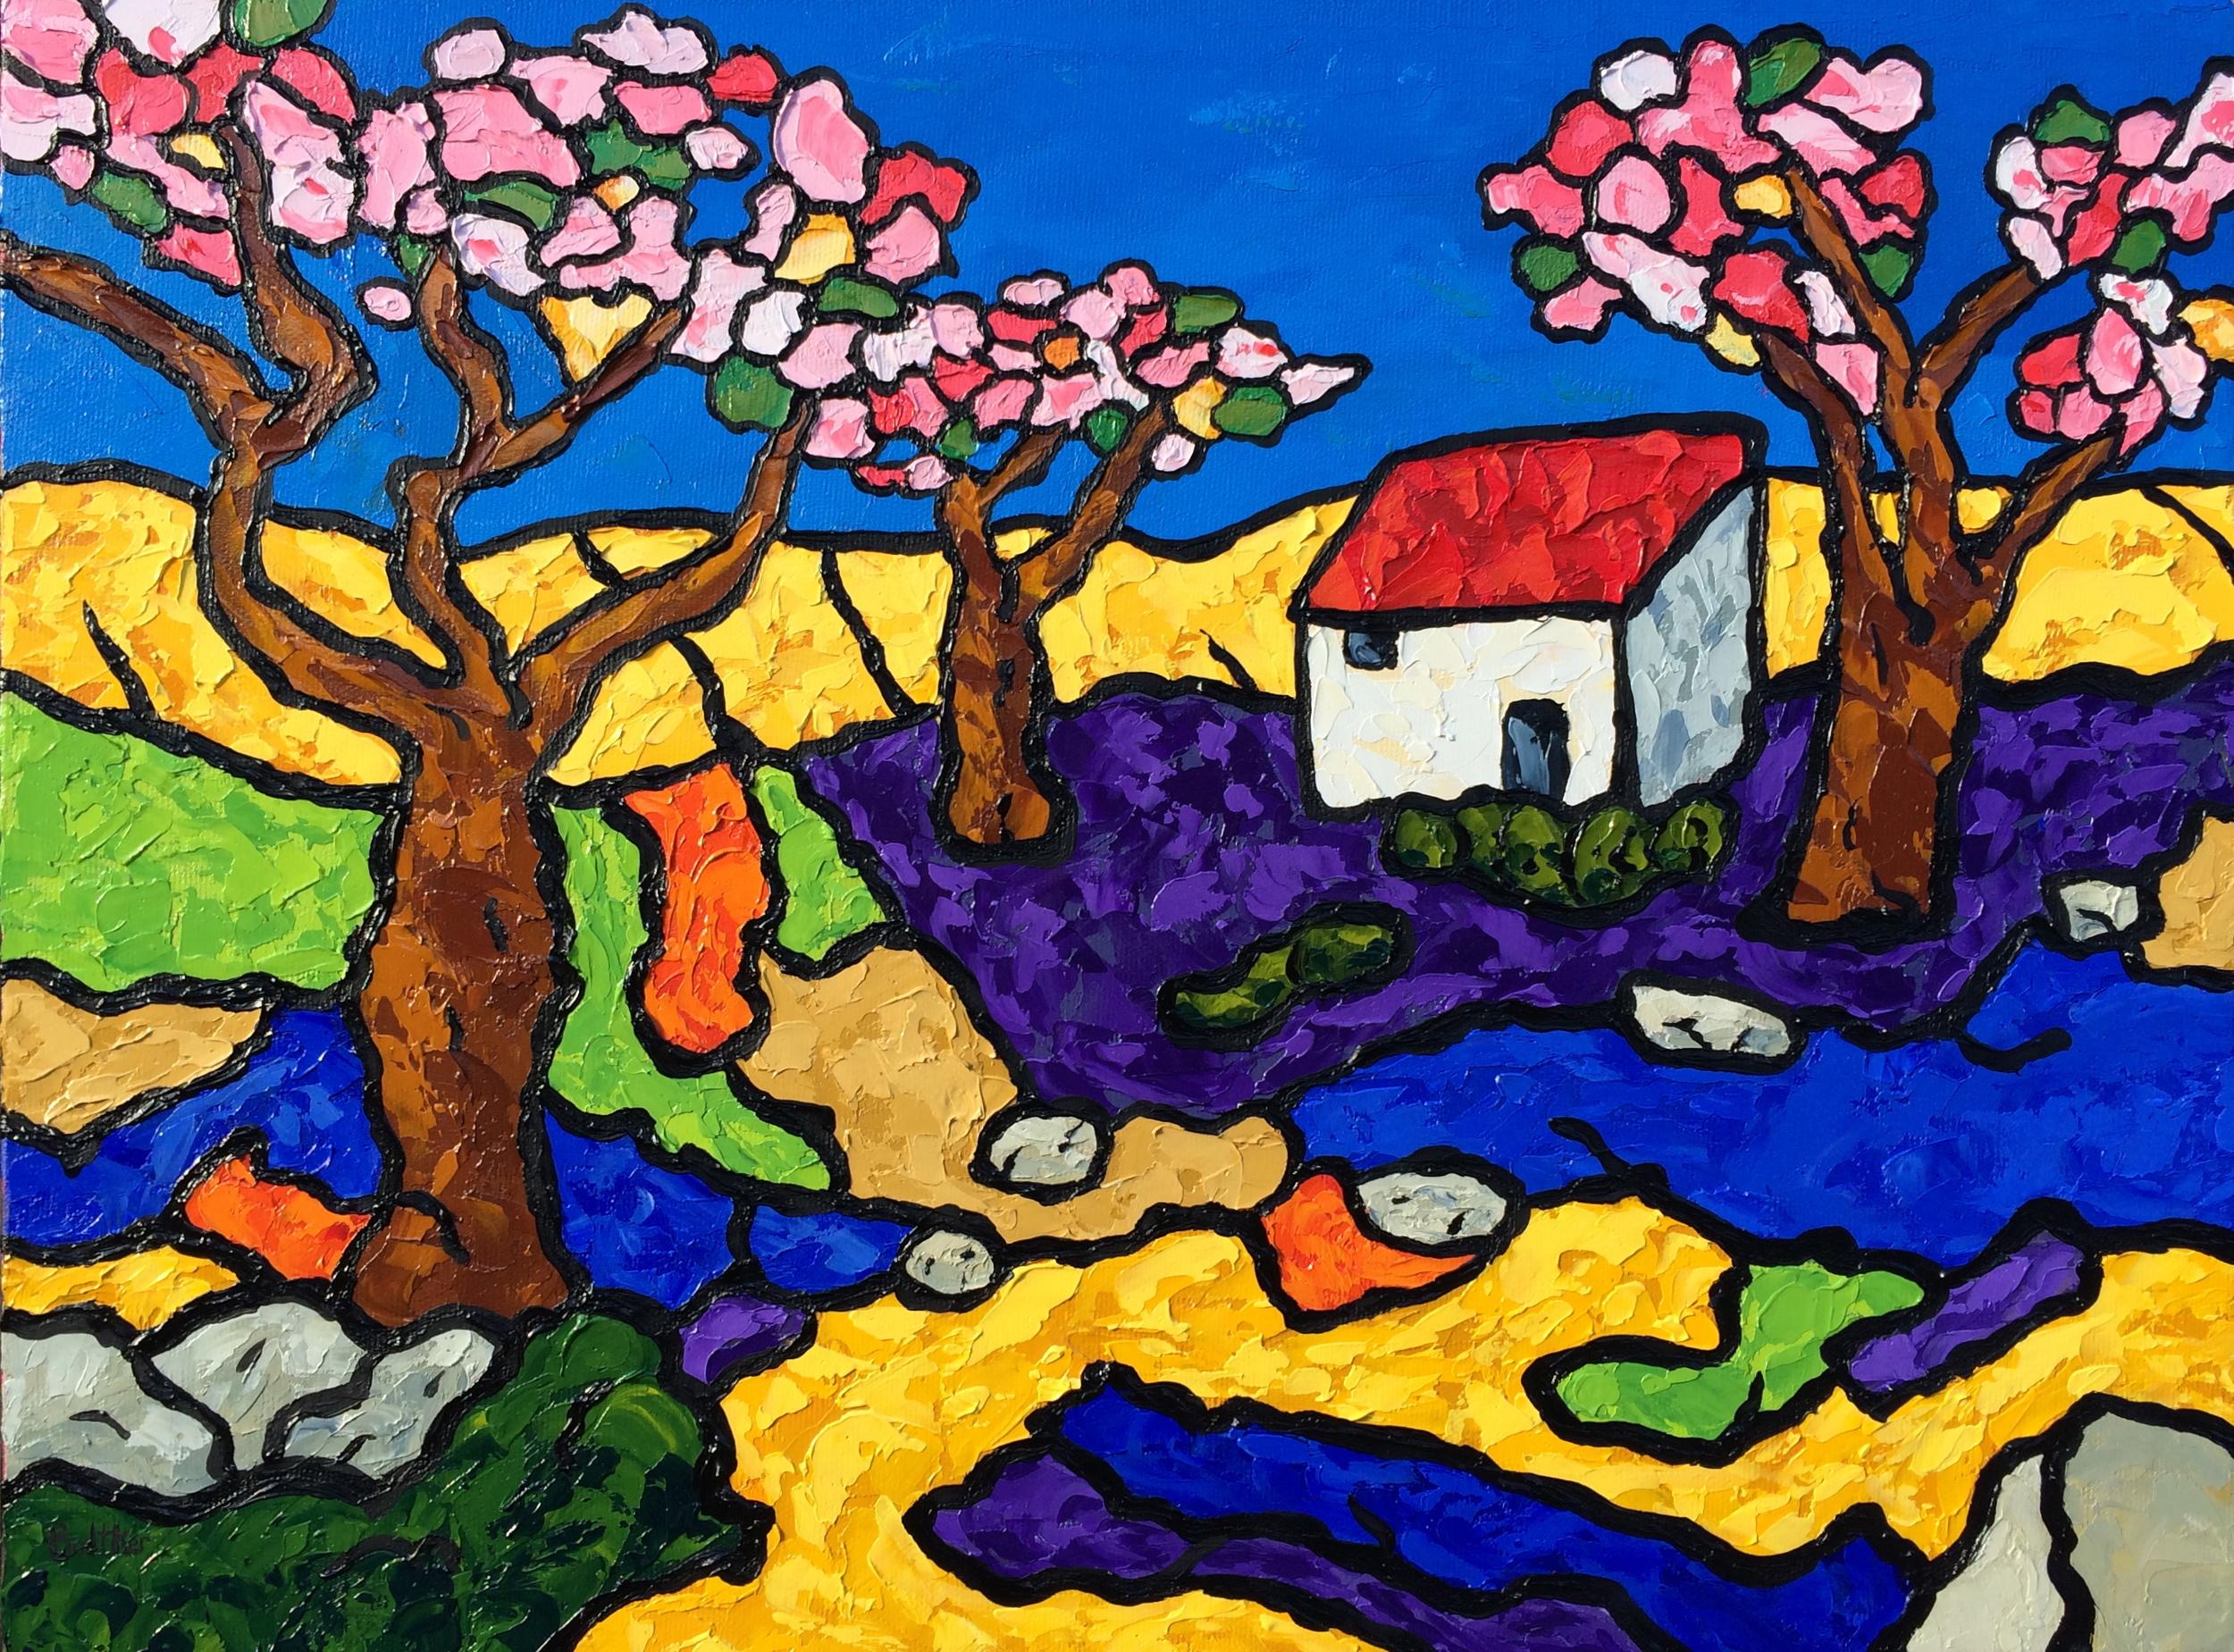 EricBodtker_Blossoming_Trees_16x12_oiloncanvas.JPG